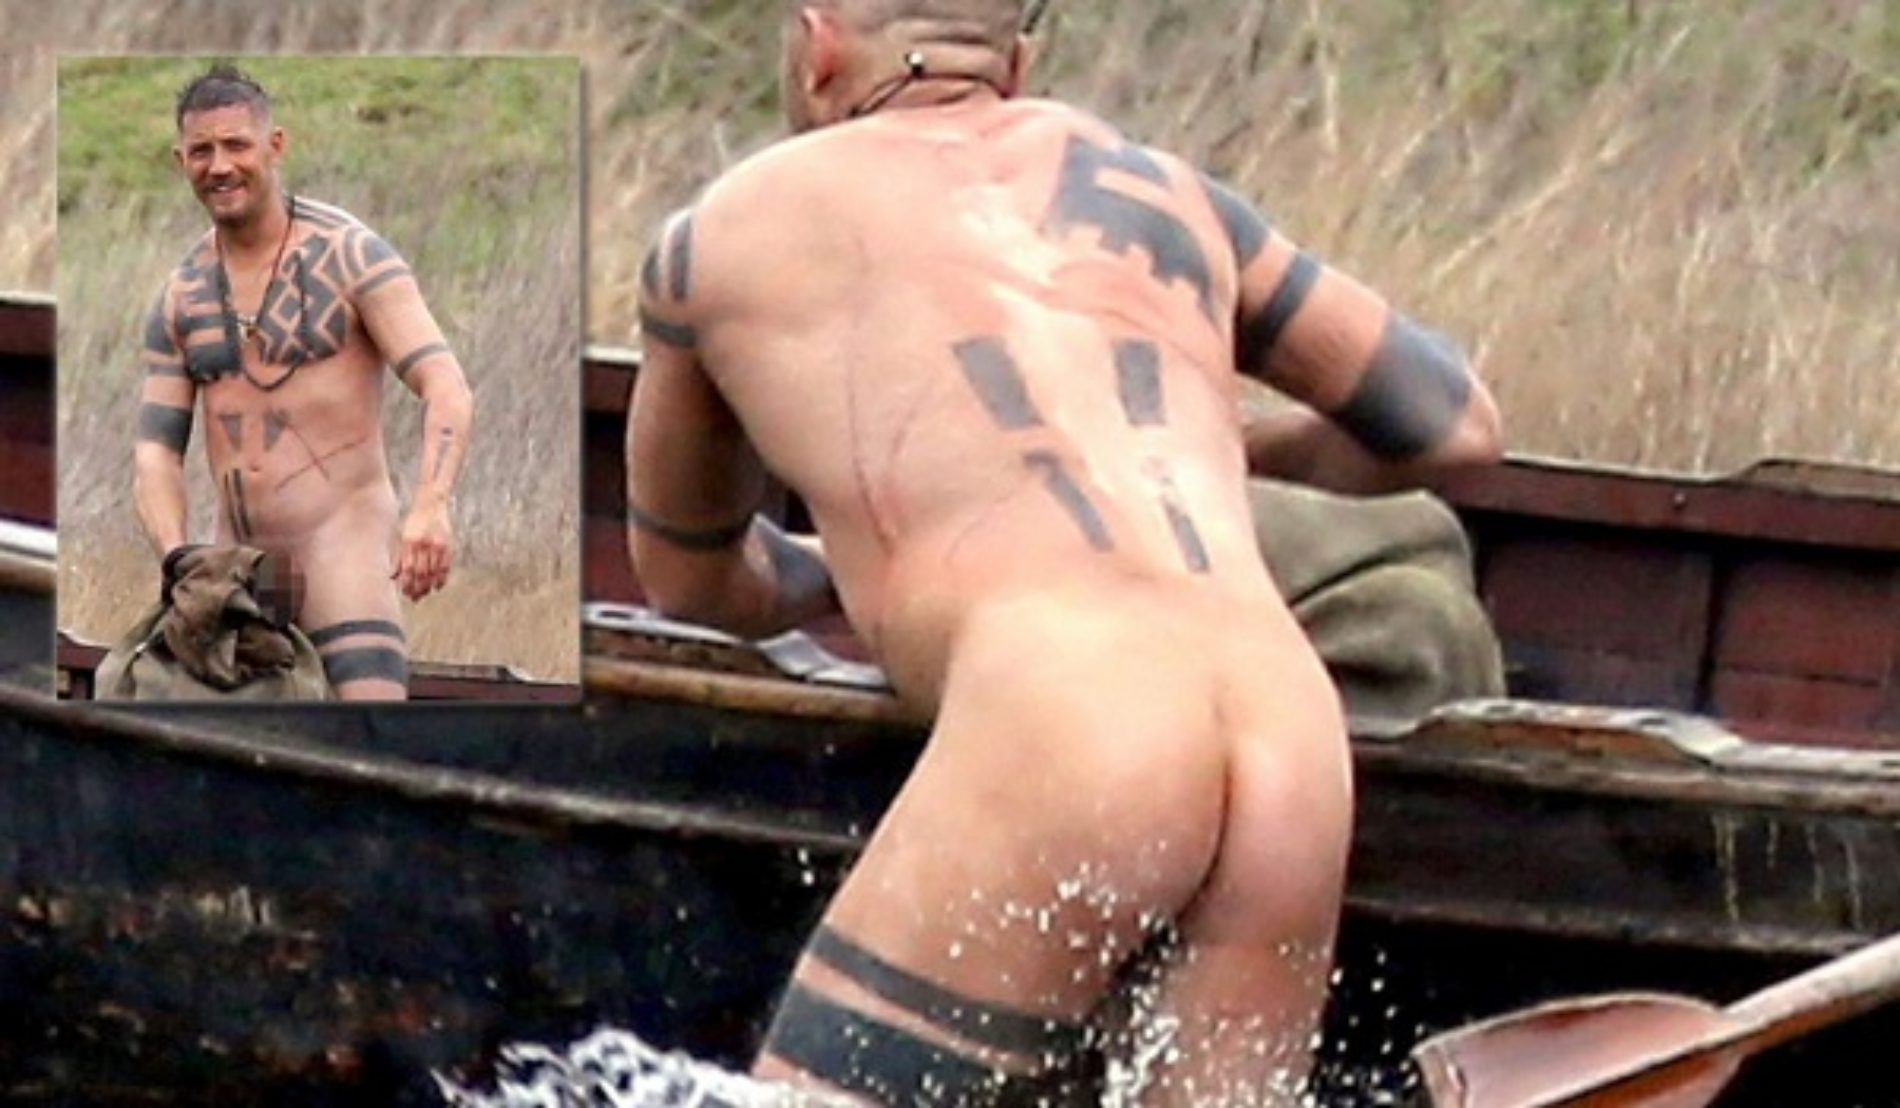 Nice Ass, Tom Hardy!